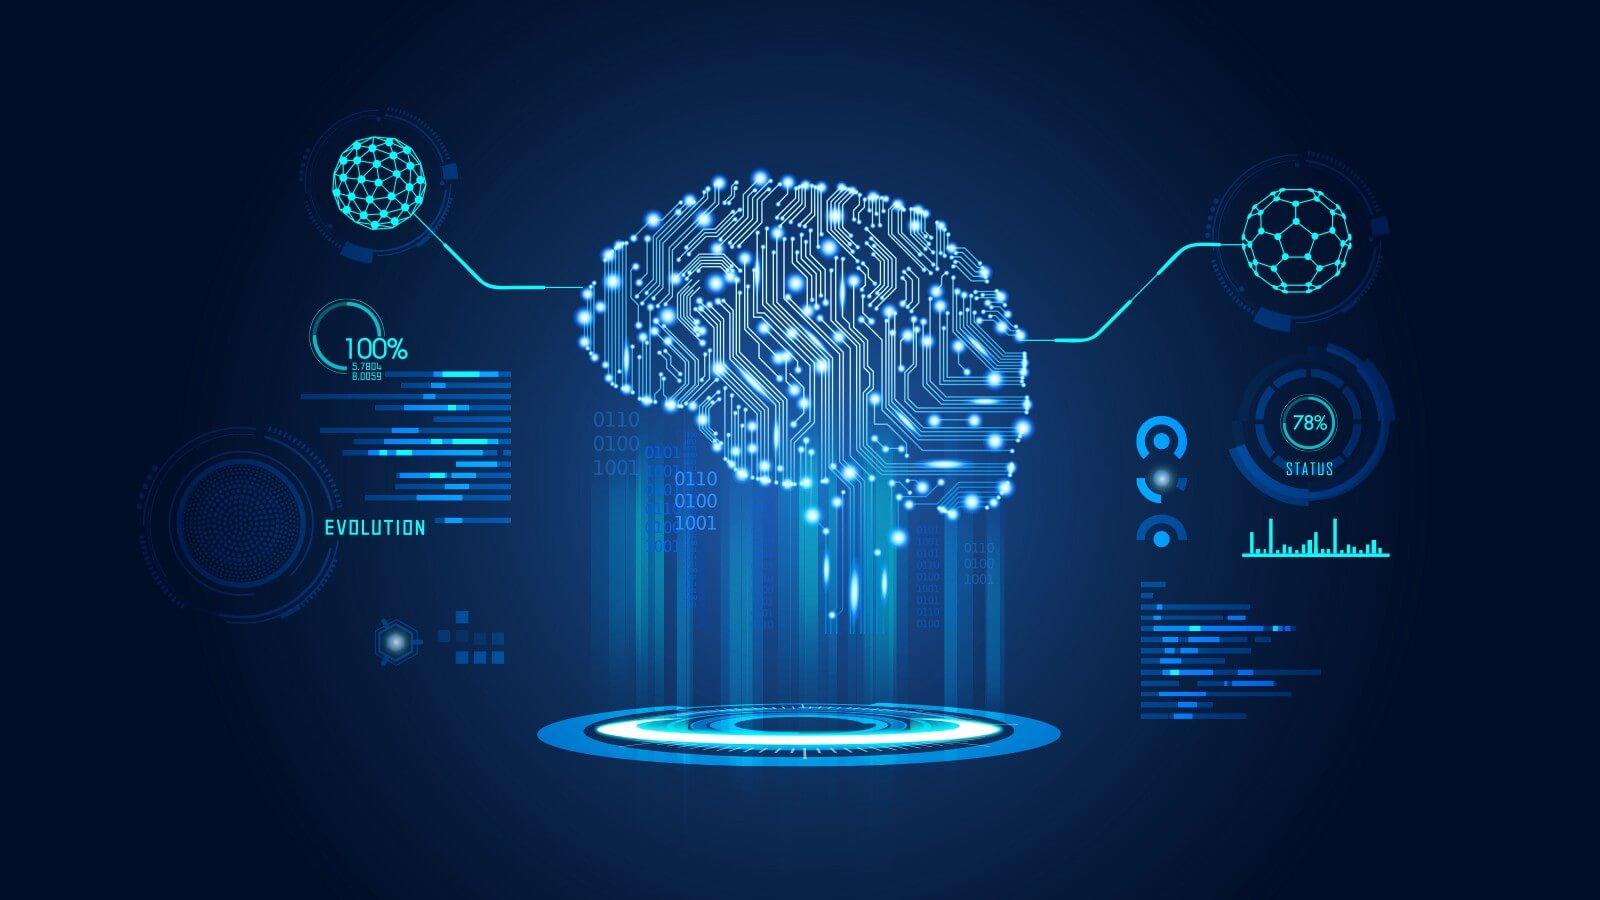 Maya Ai brain for entrepreneurs